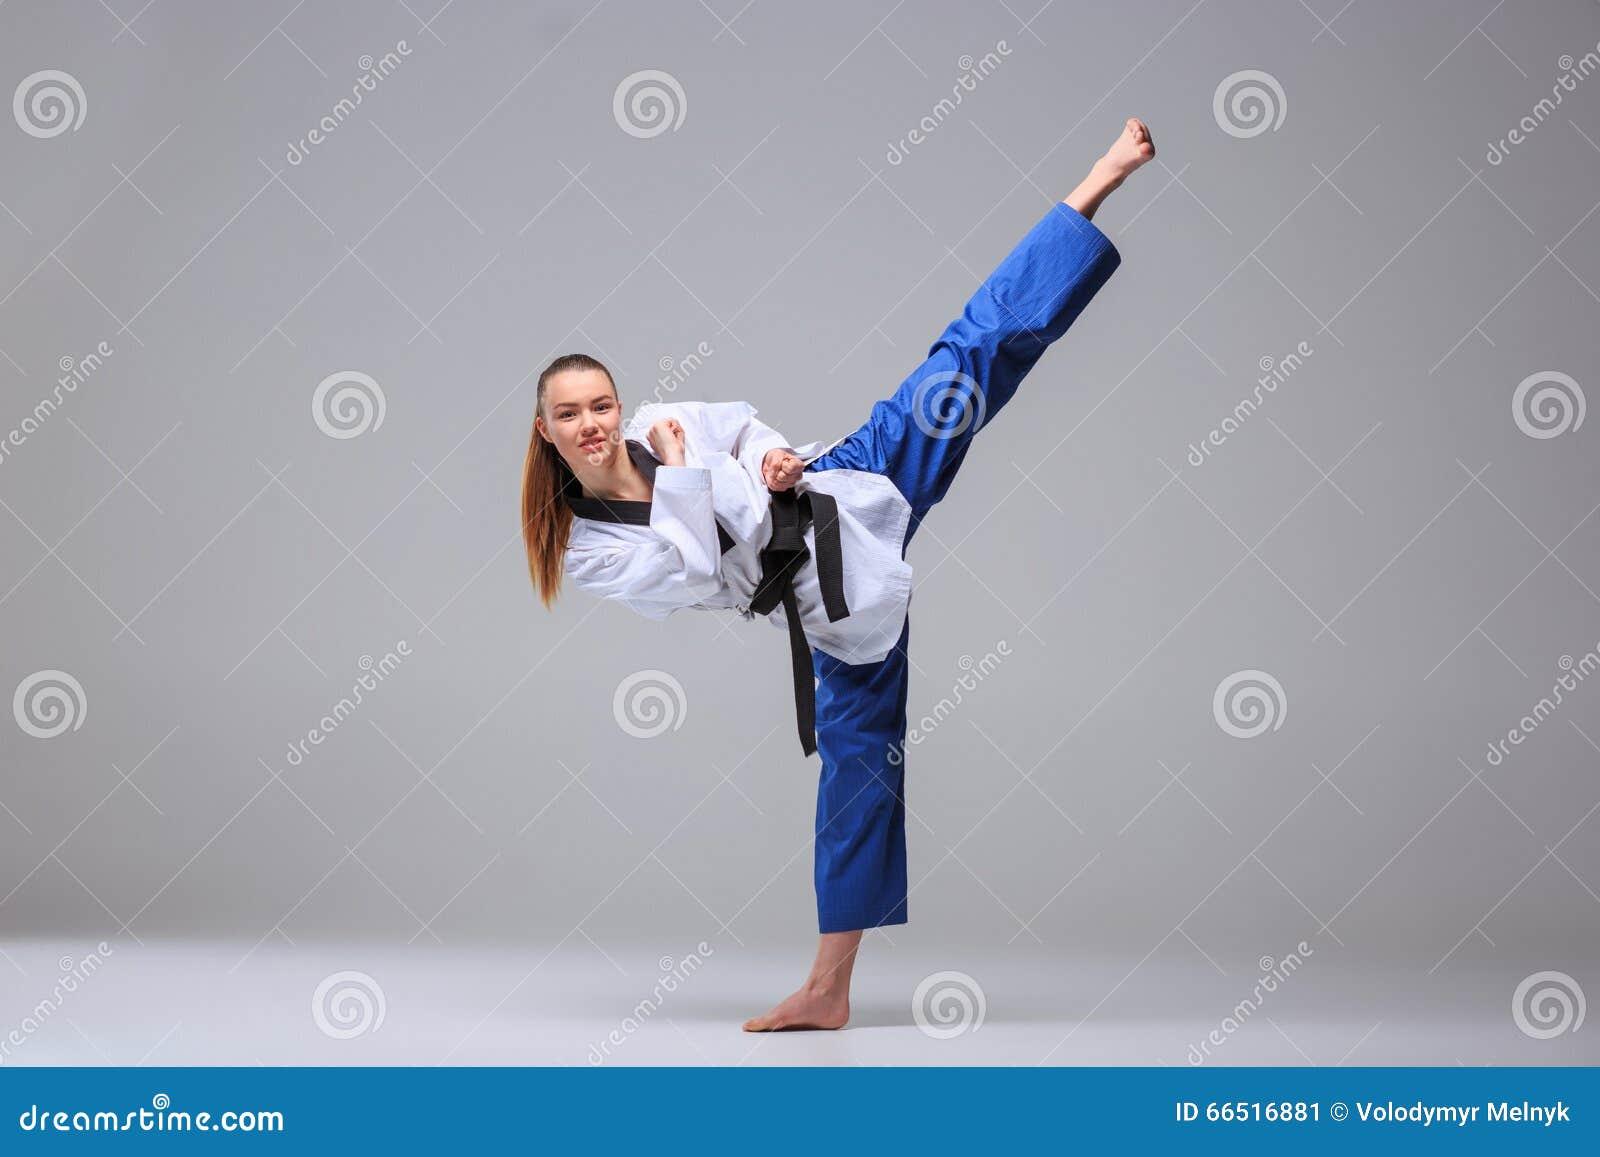 Девушка в кимоно каратэ фото